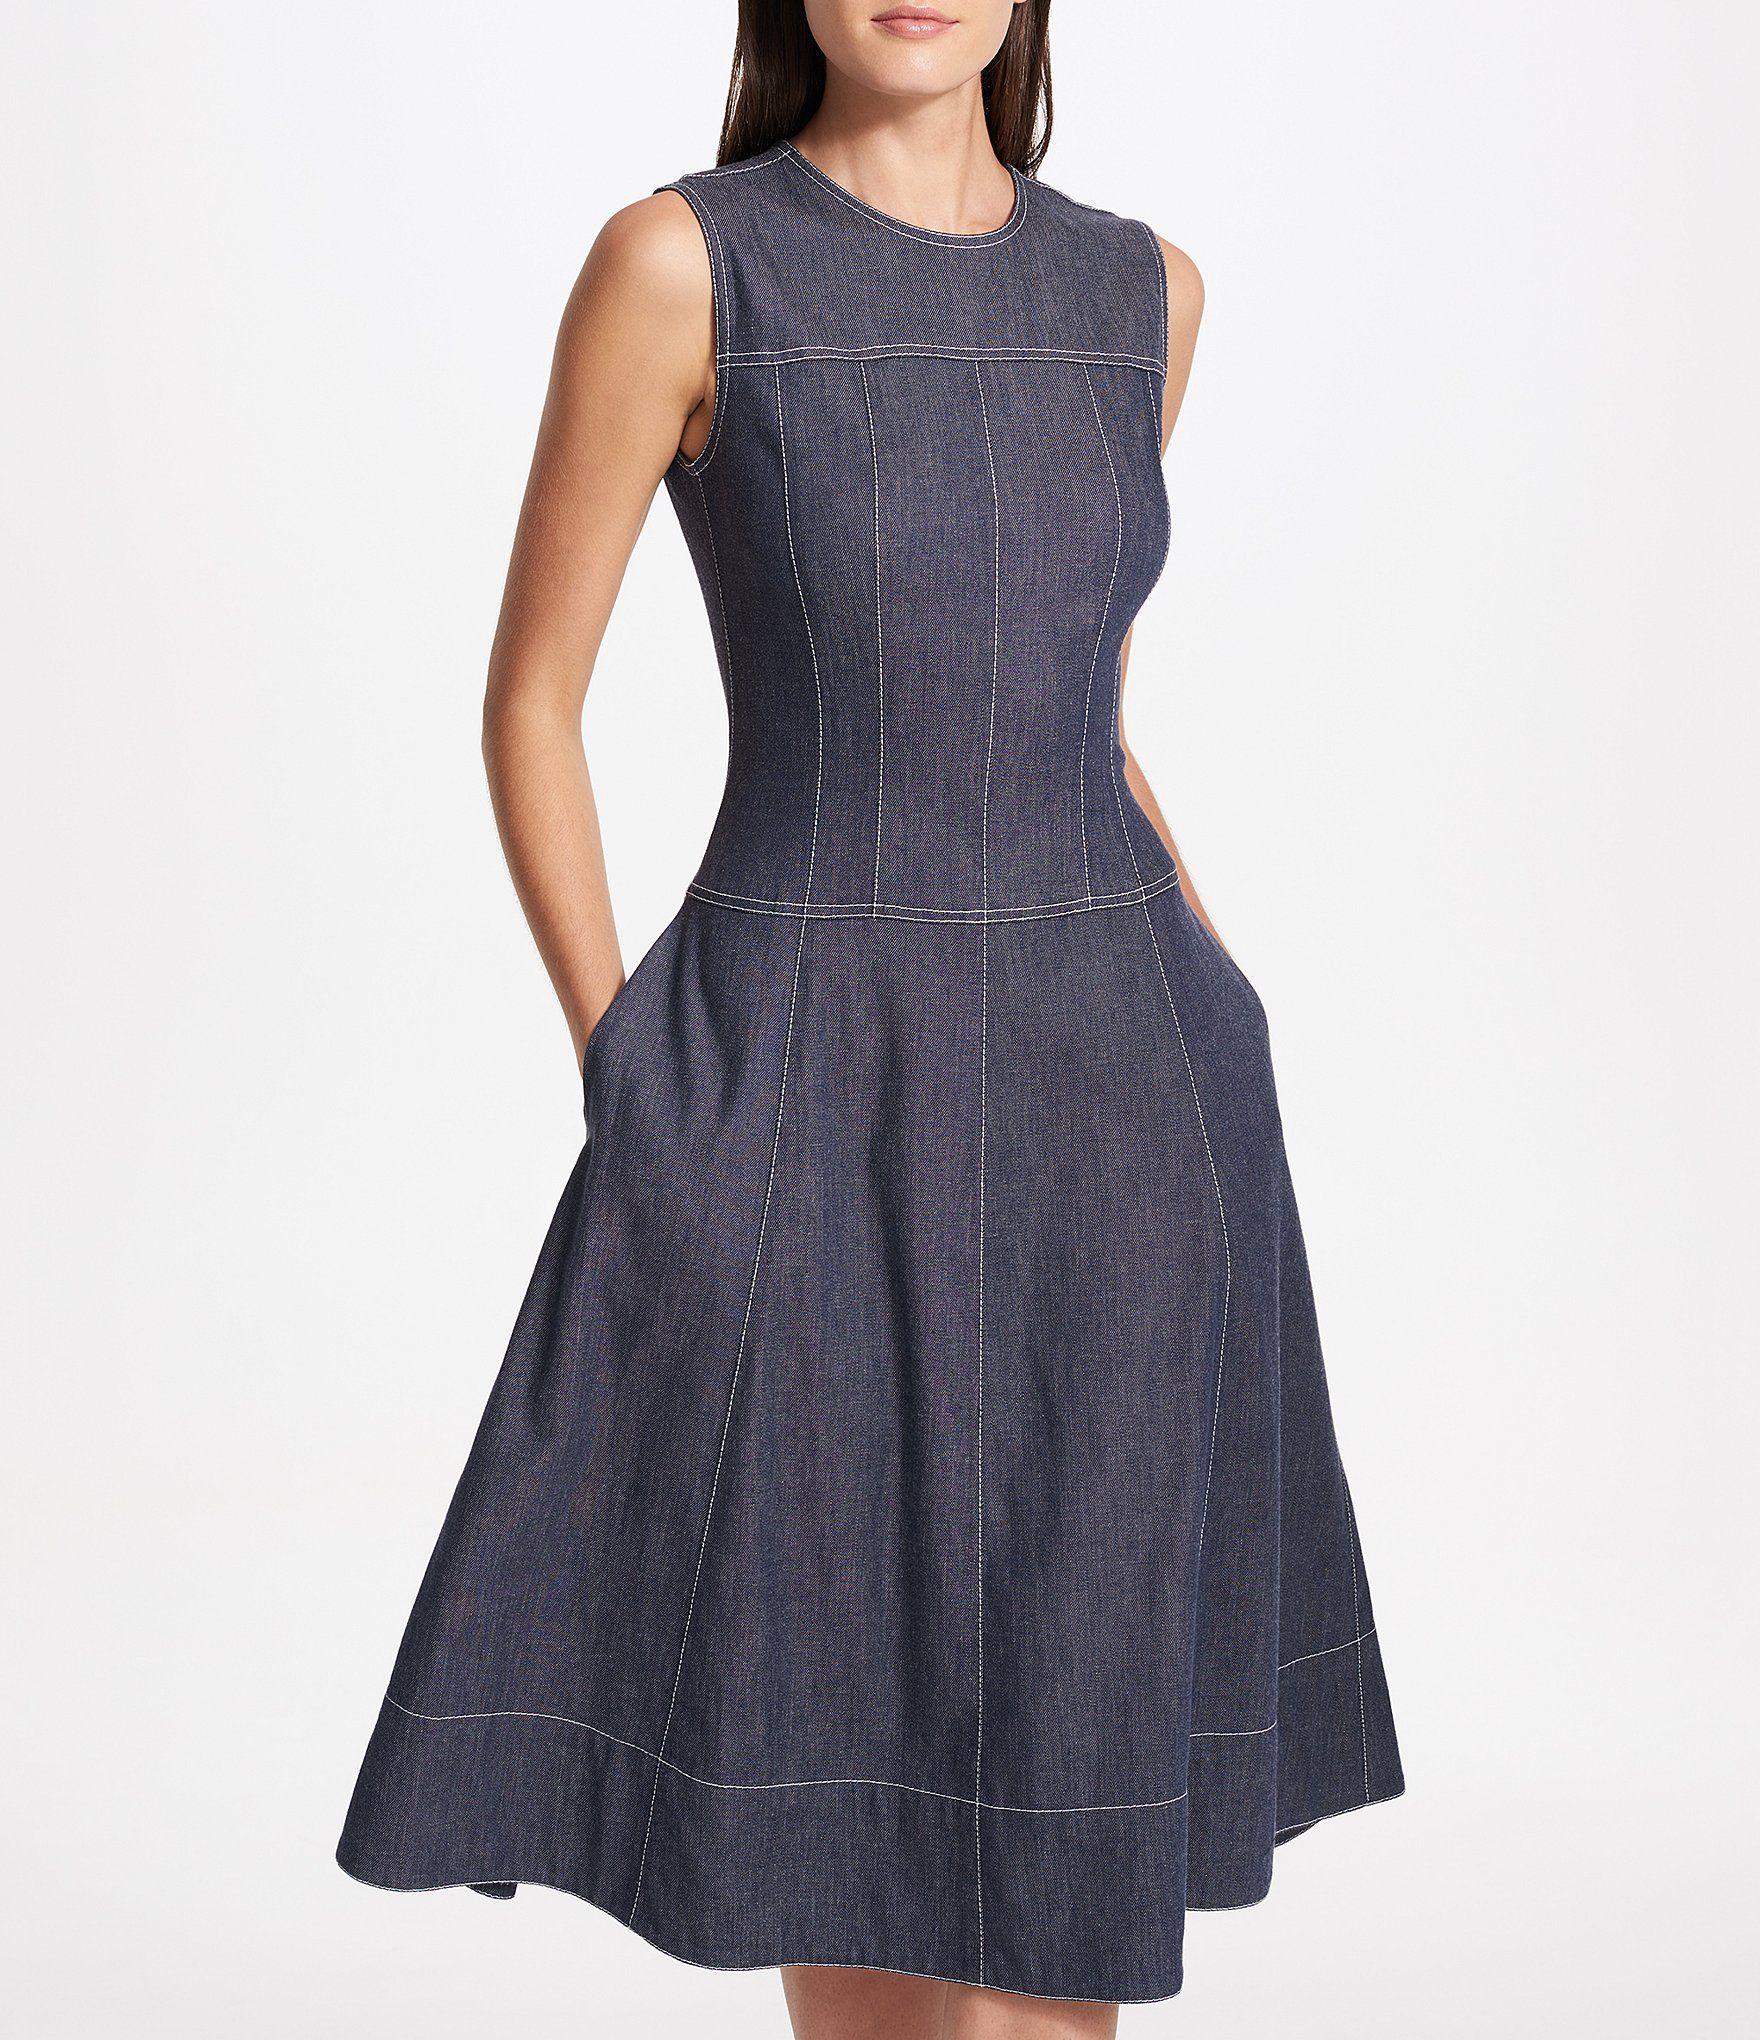 Donna Karan New York Stretch Denim Seamed Panel Fit-and Flare Midi Dress